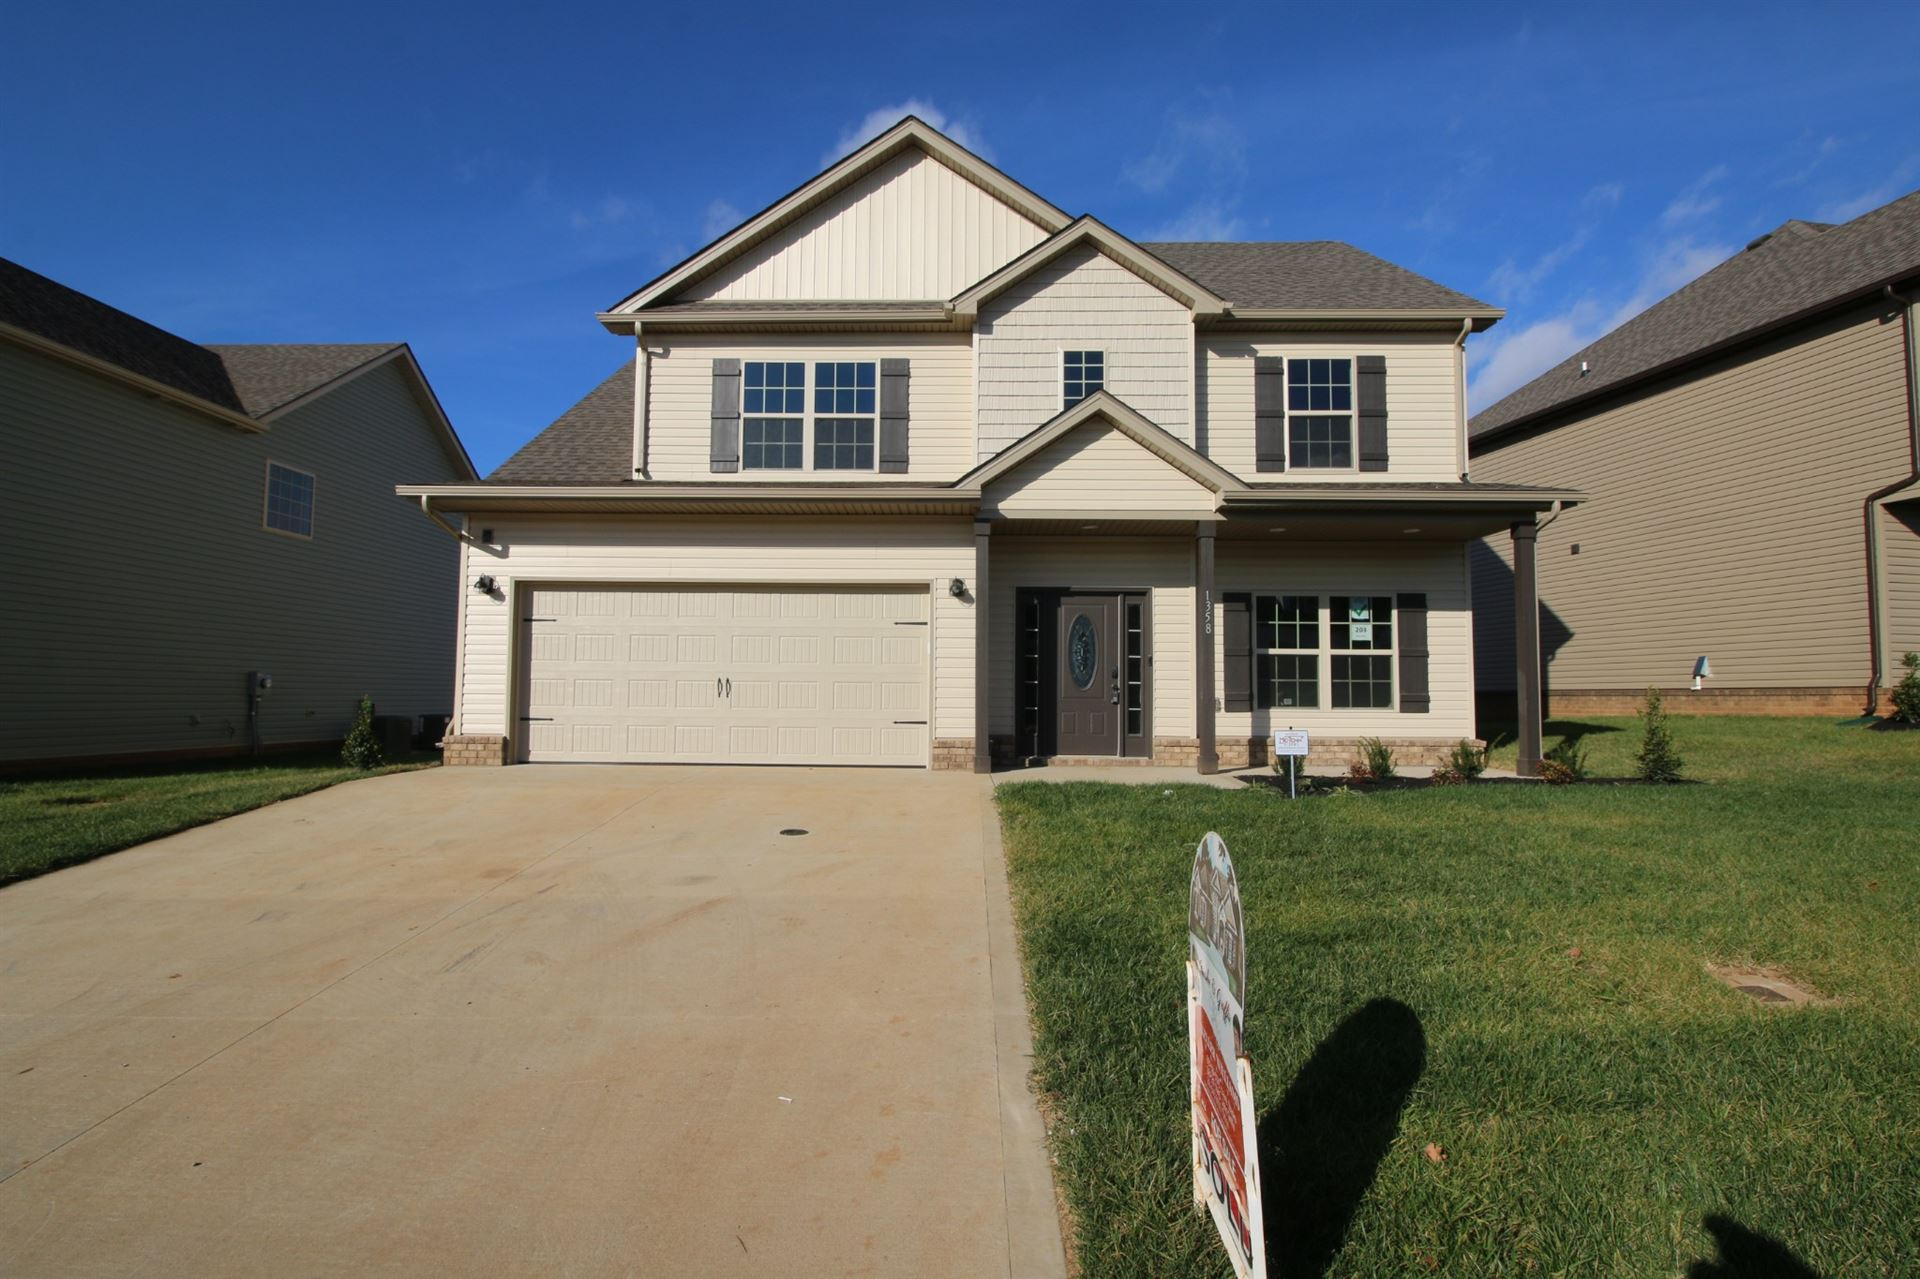 203 Mills Creek, Clarksville, TN 37042 - MLS#: 2281377